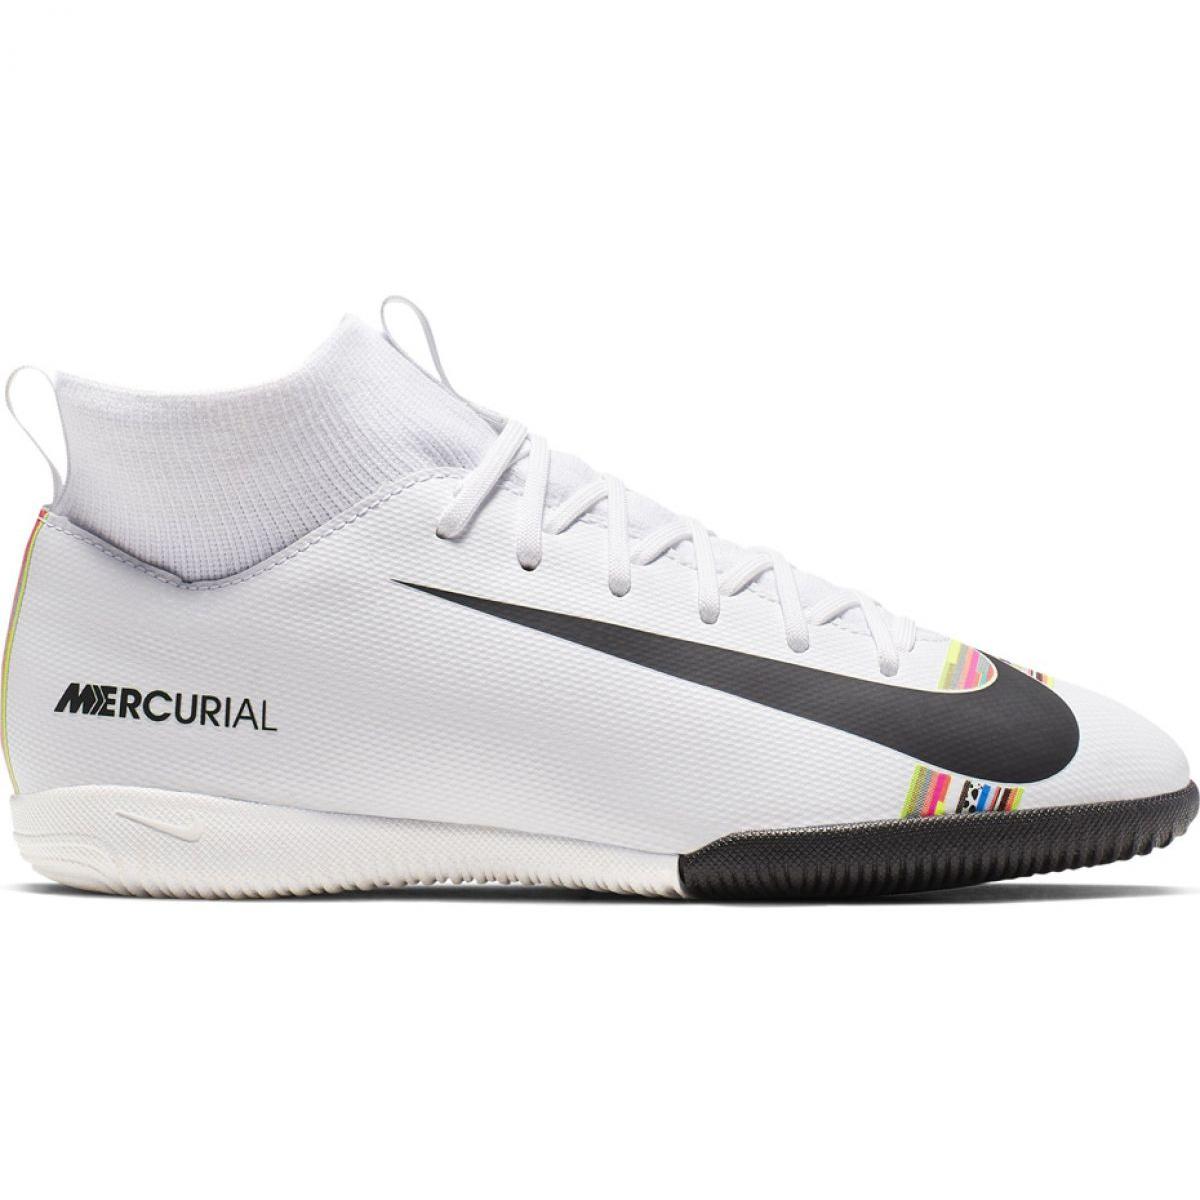 Jr 6 Ic Nike Mercurial Academy Schuhe X Aj3110 Superfly 109